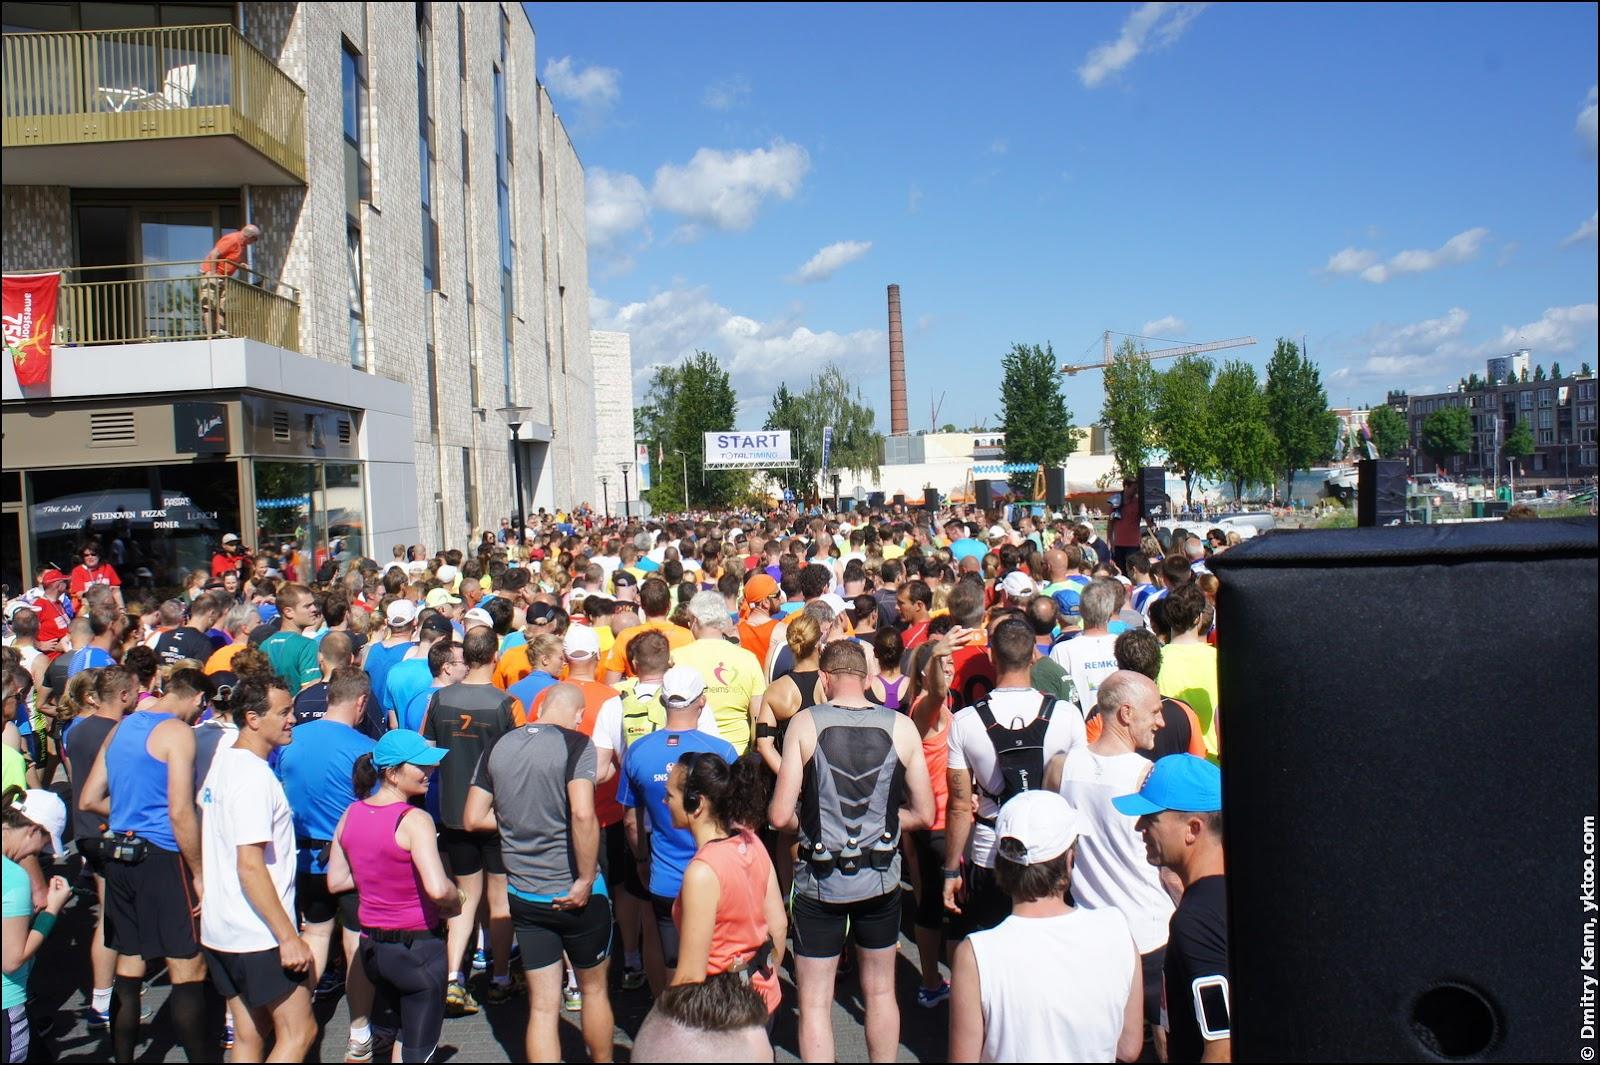 The start of the marathon and the half marathon.